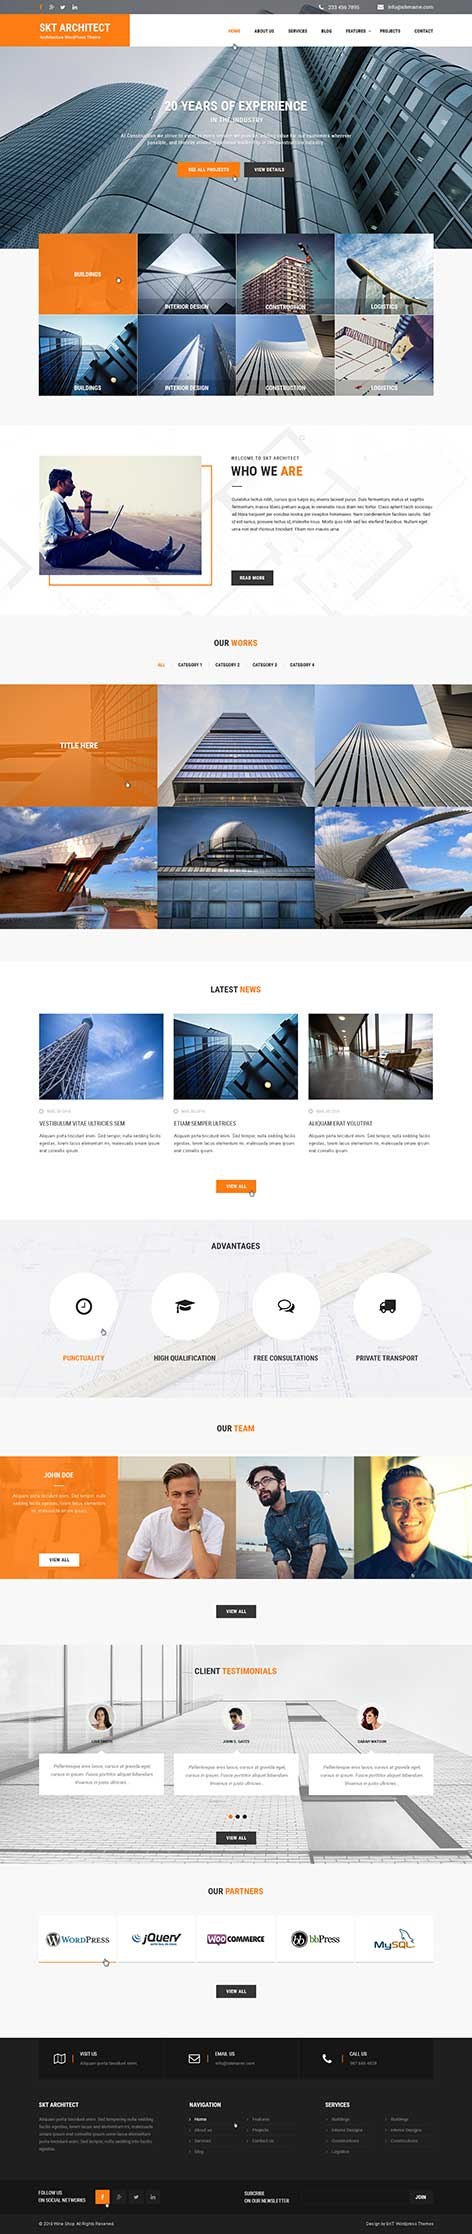 architect wordpress theme1 - Architect